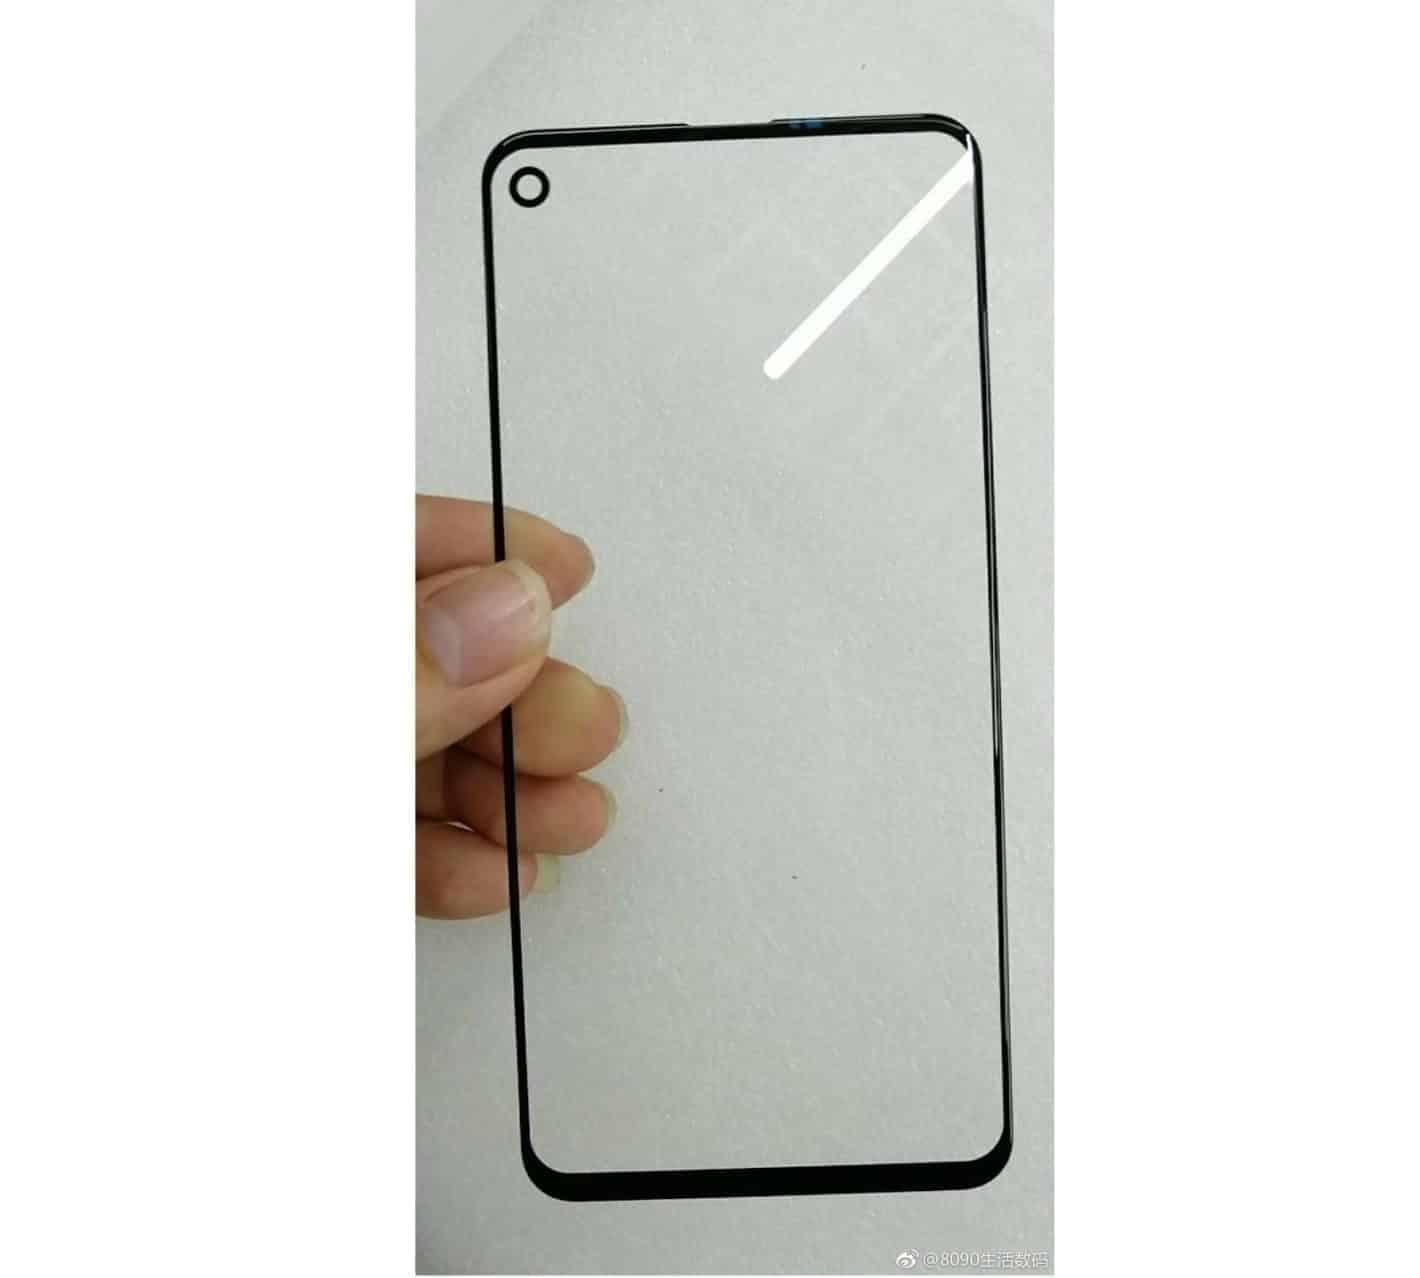 Galaxy A8s screen protector leak 1